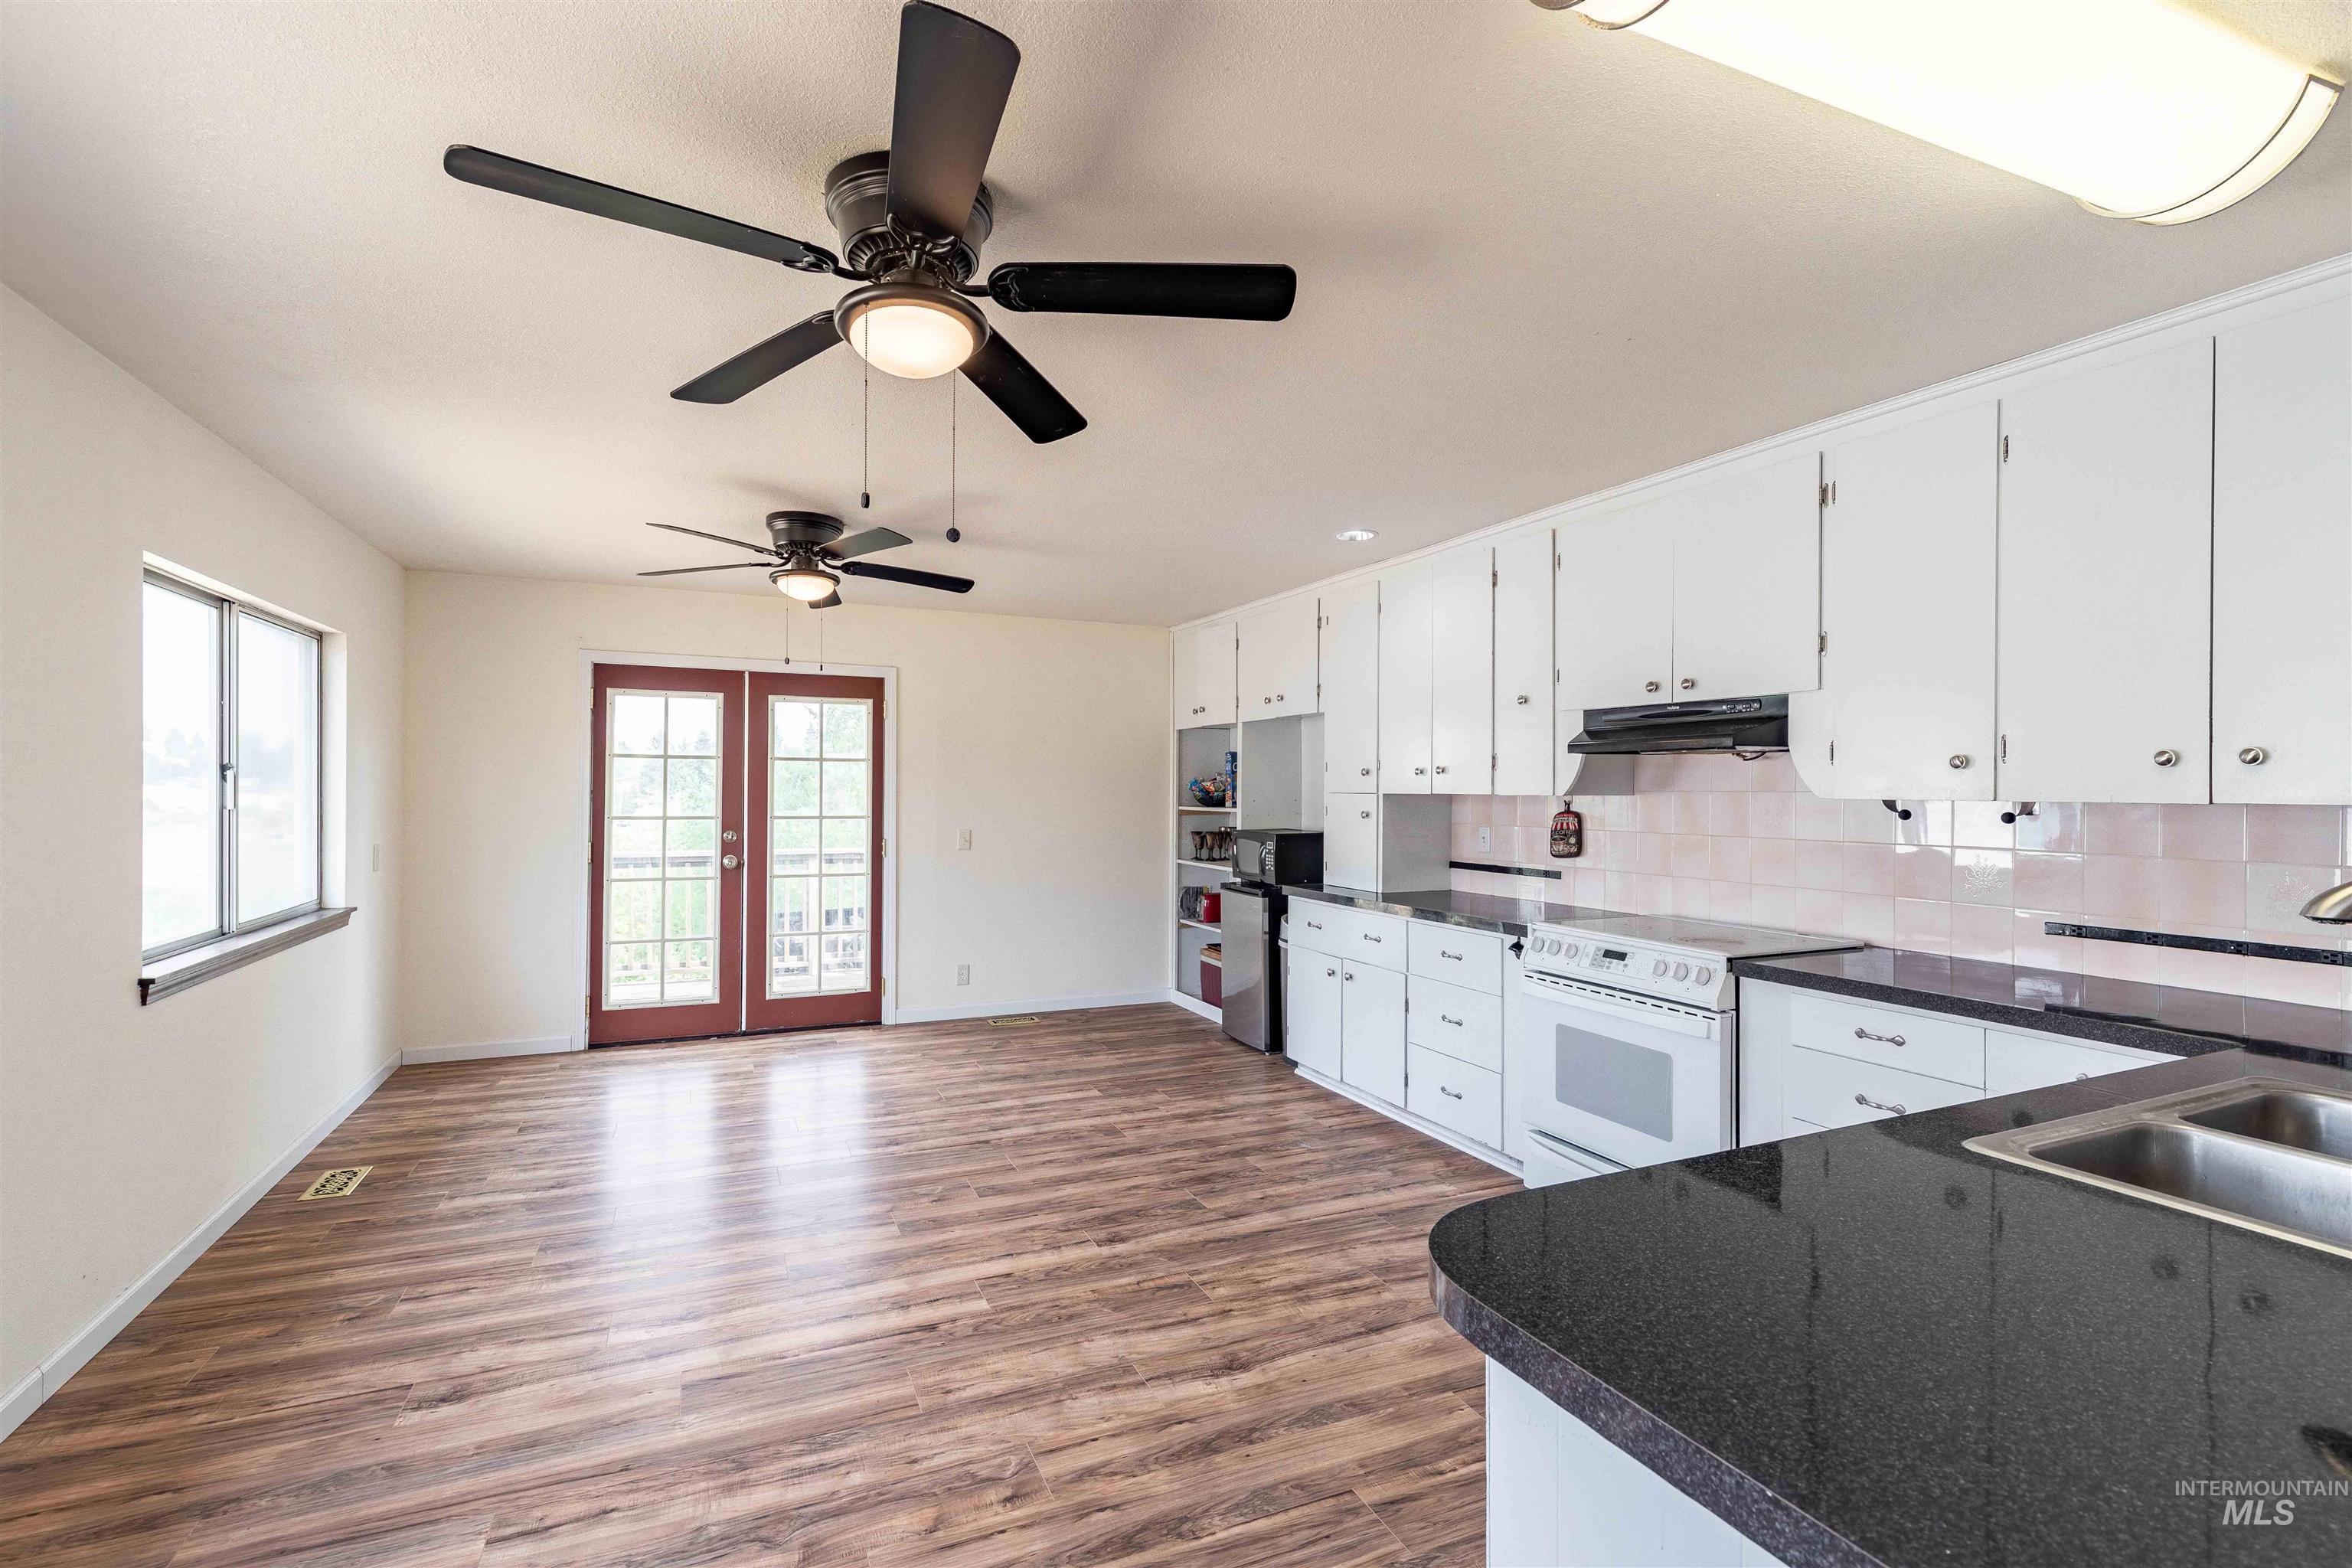 346 N Jackson Property Photo 15